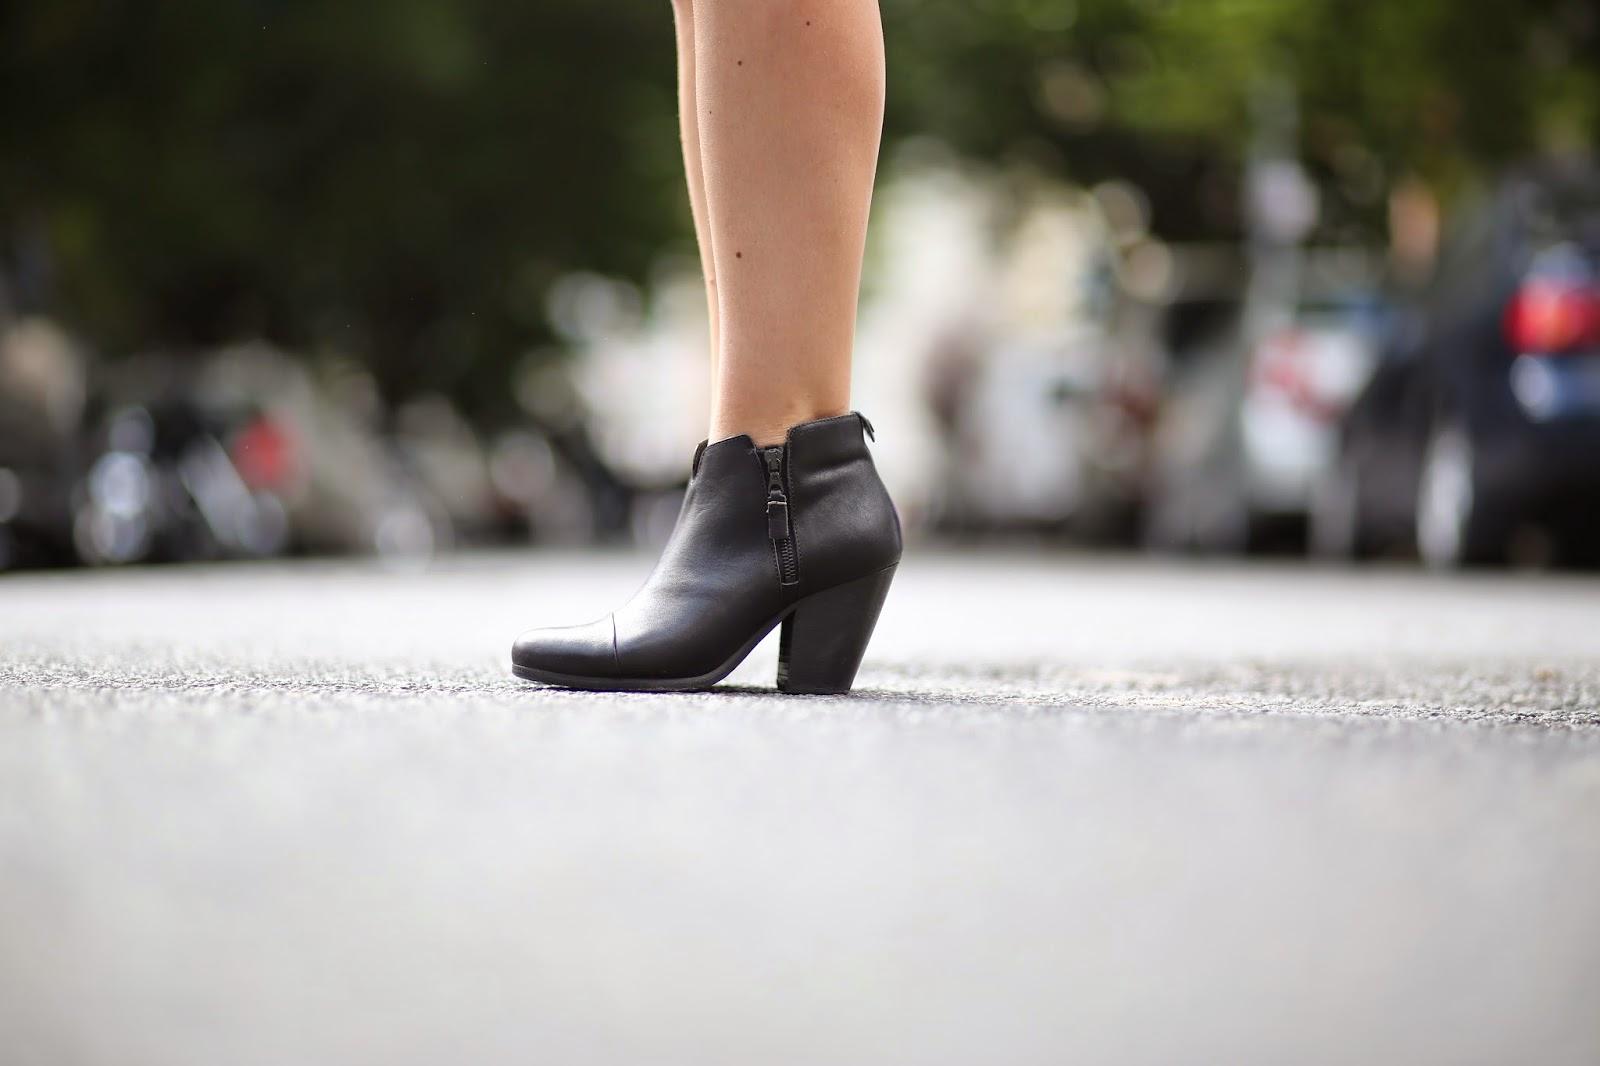 Rag and Bone Margot Ankle Boots, Rag & Bone, Margot, Booties, Saks,